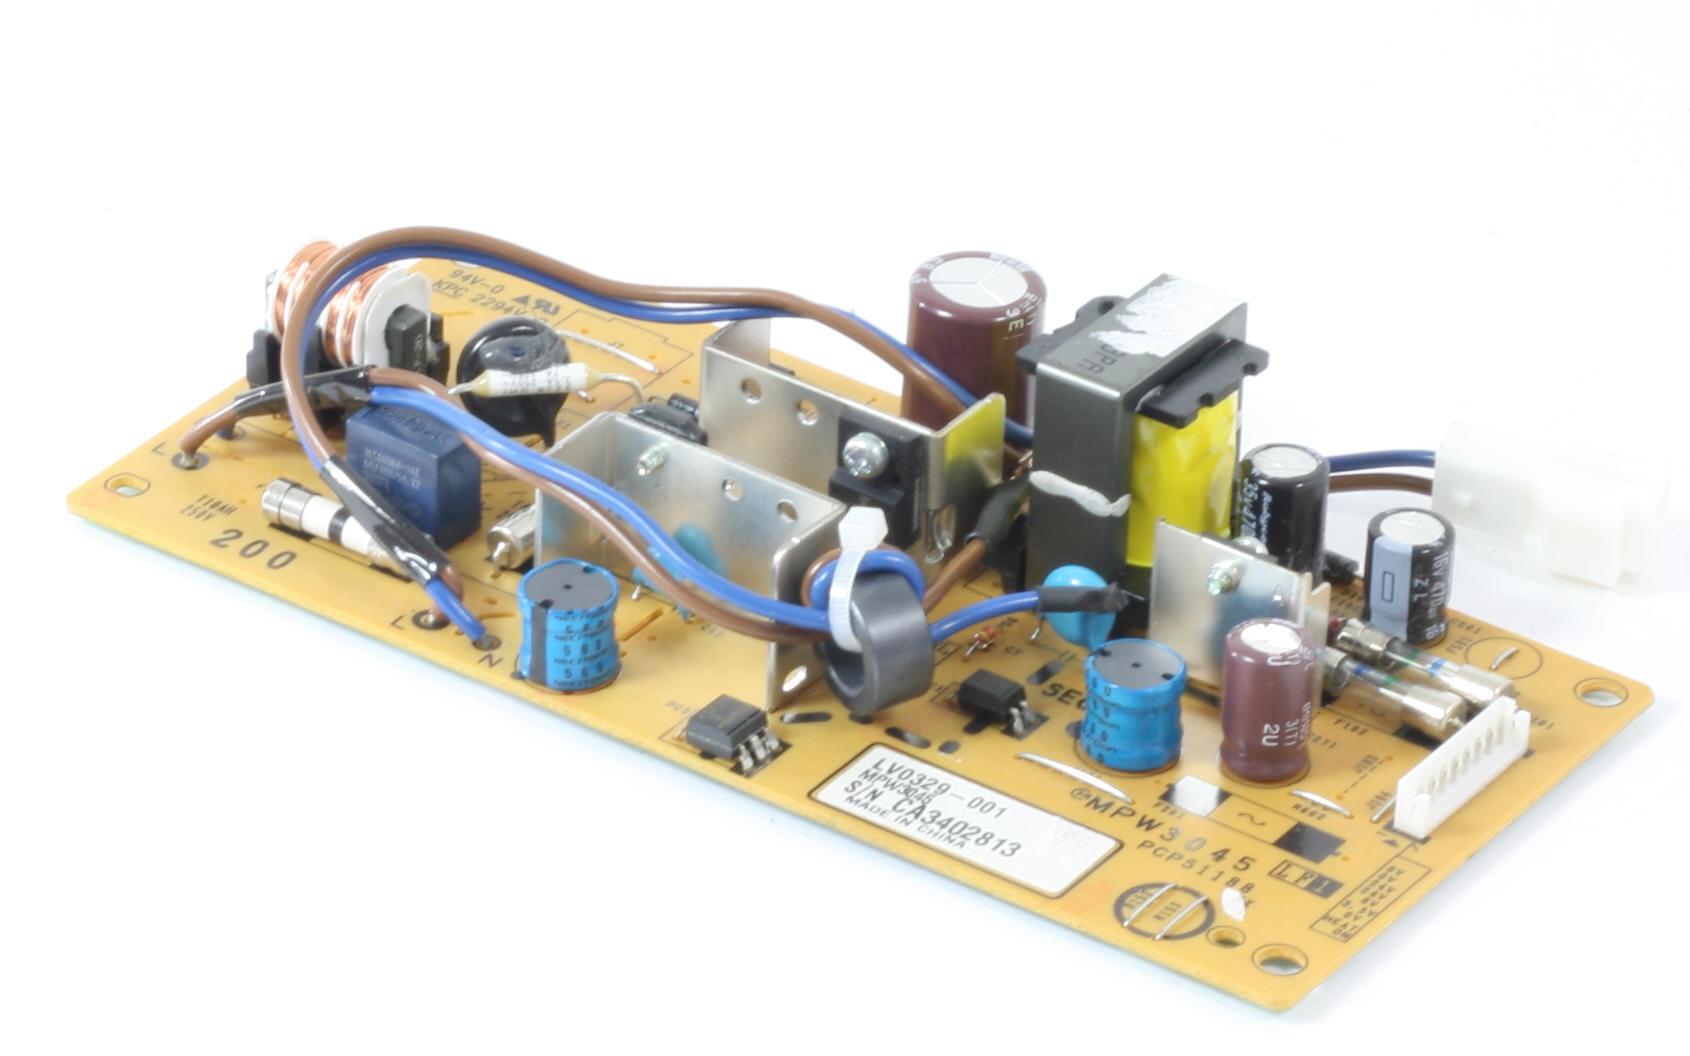 Brother Netzteil LV0329-001 POWER SUPPLY HL-5350 HL5350N HL5350DN  HL-5340 gebraucht